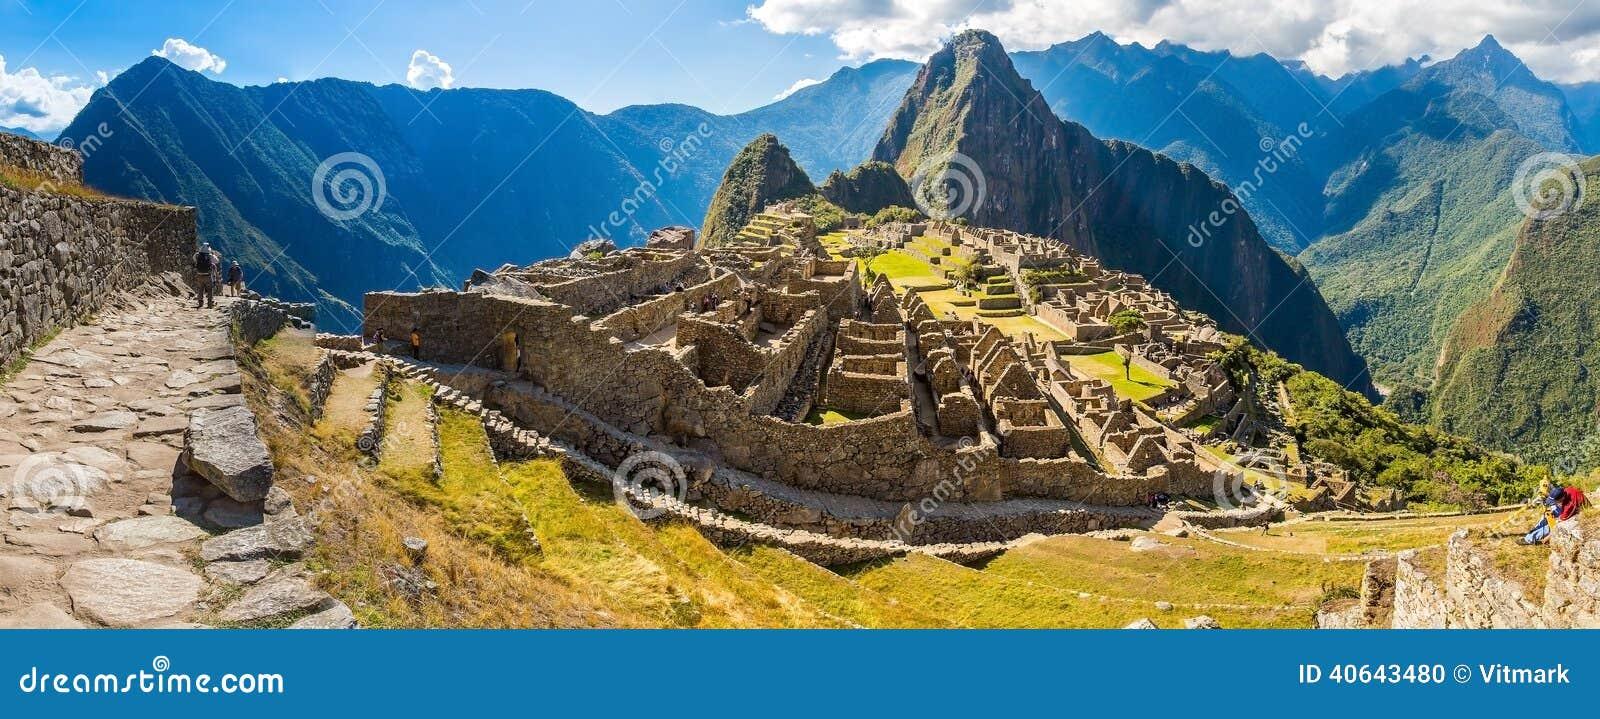 Panorama van Geheimzinnige stad - Machu Picchu, Peru, Zuid-Amerika De Incan-ruïnes